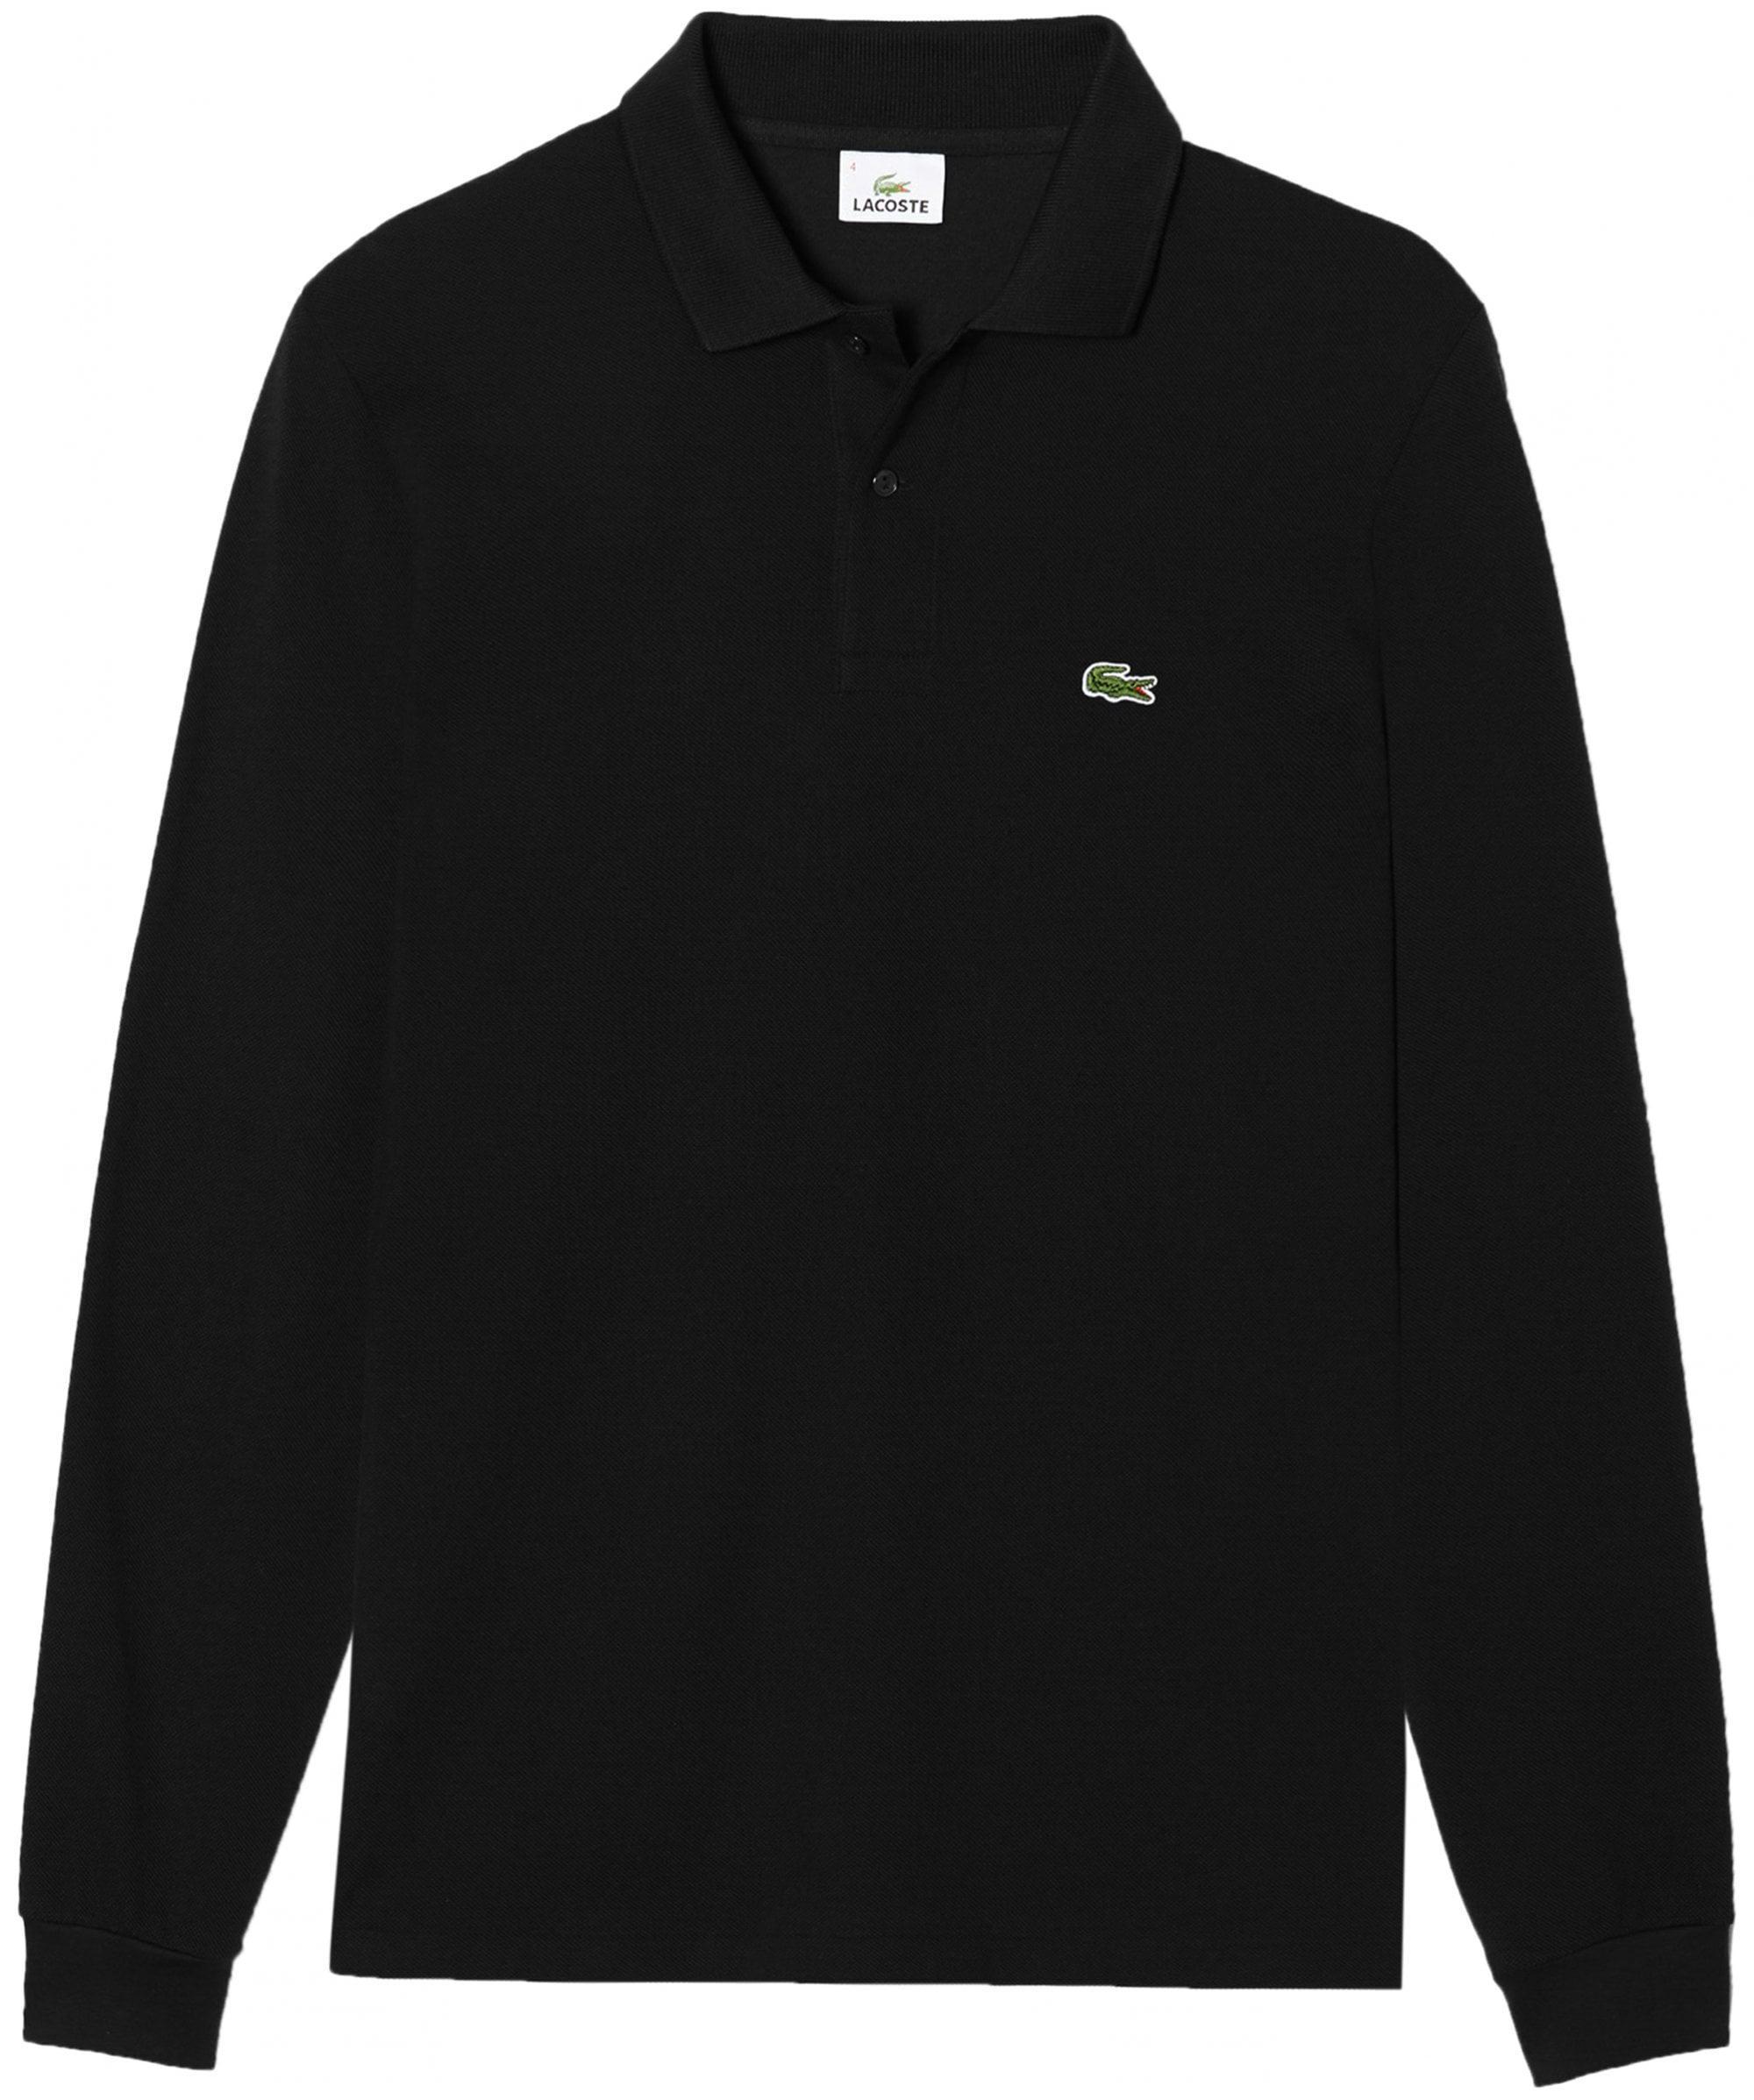 2f5f34743d6d9 Lacoste - Black Classic Fit Long Sleeve Polo Shirt for Men - Lyst. View  fullscreen